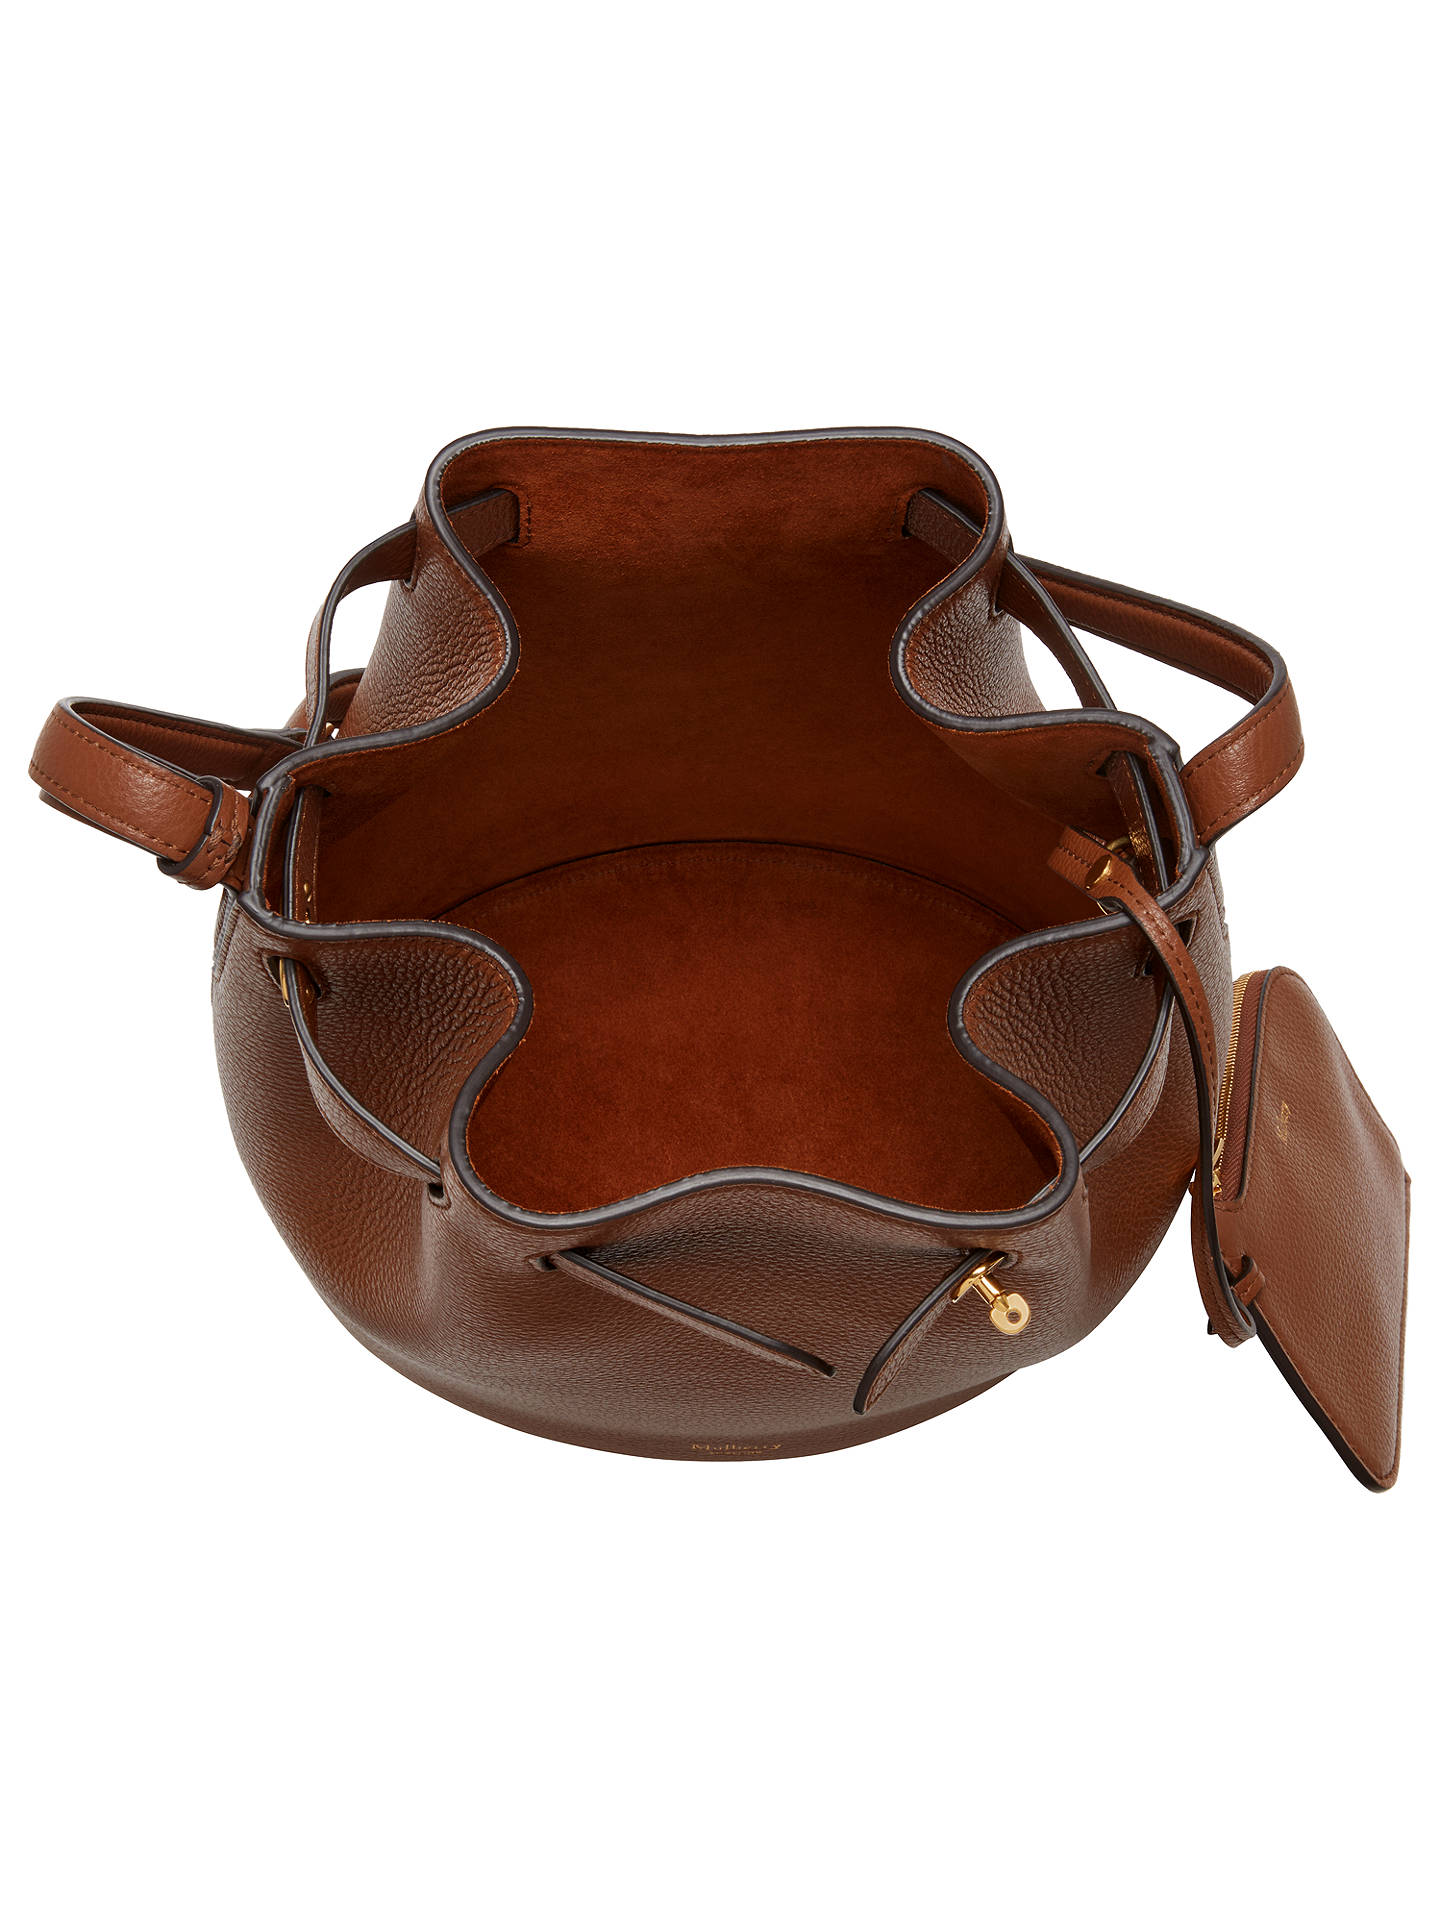 3b74bdfd87dc ... BuyMulberry Abbey Natural Grain Leather Bucket Bag